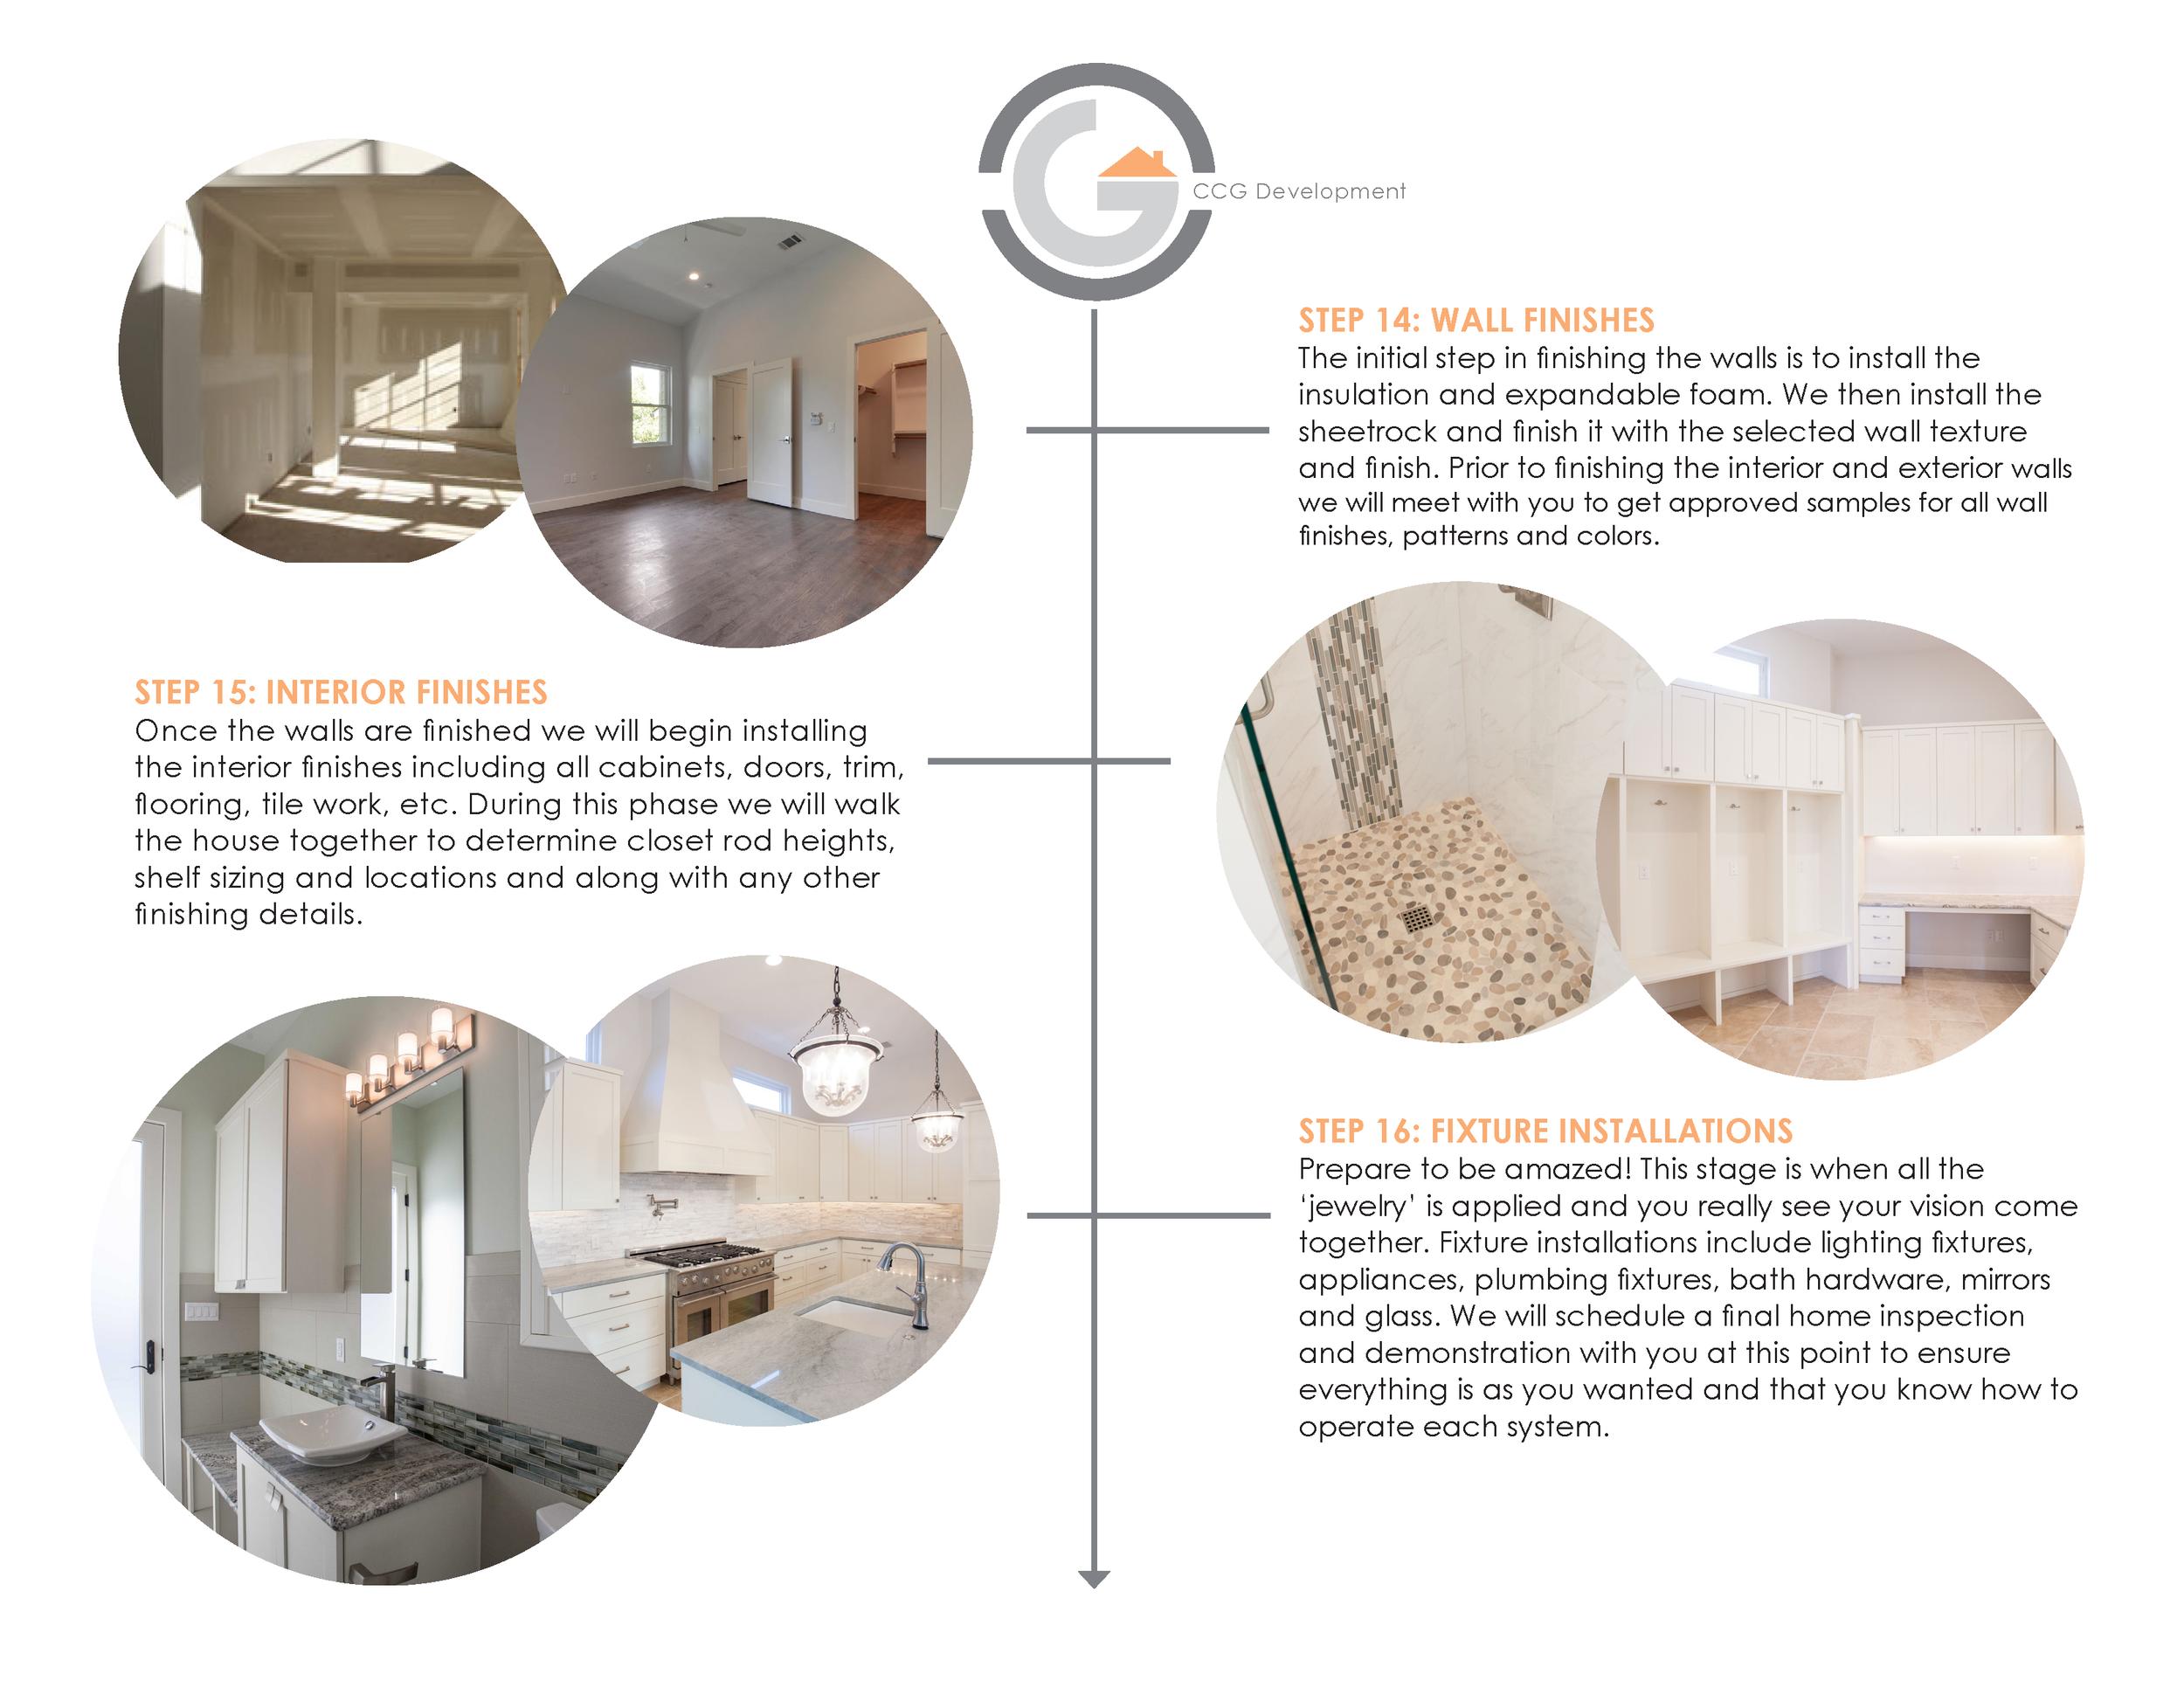 CCG Development Custom Home Process Chart V2 - Slides_Page_5.png